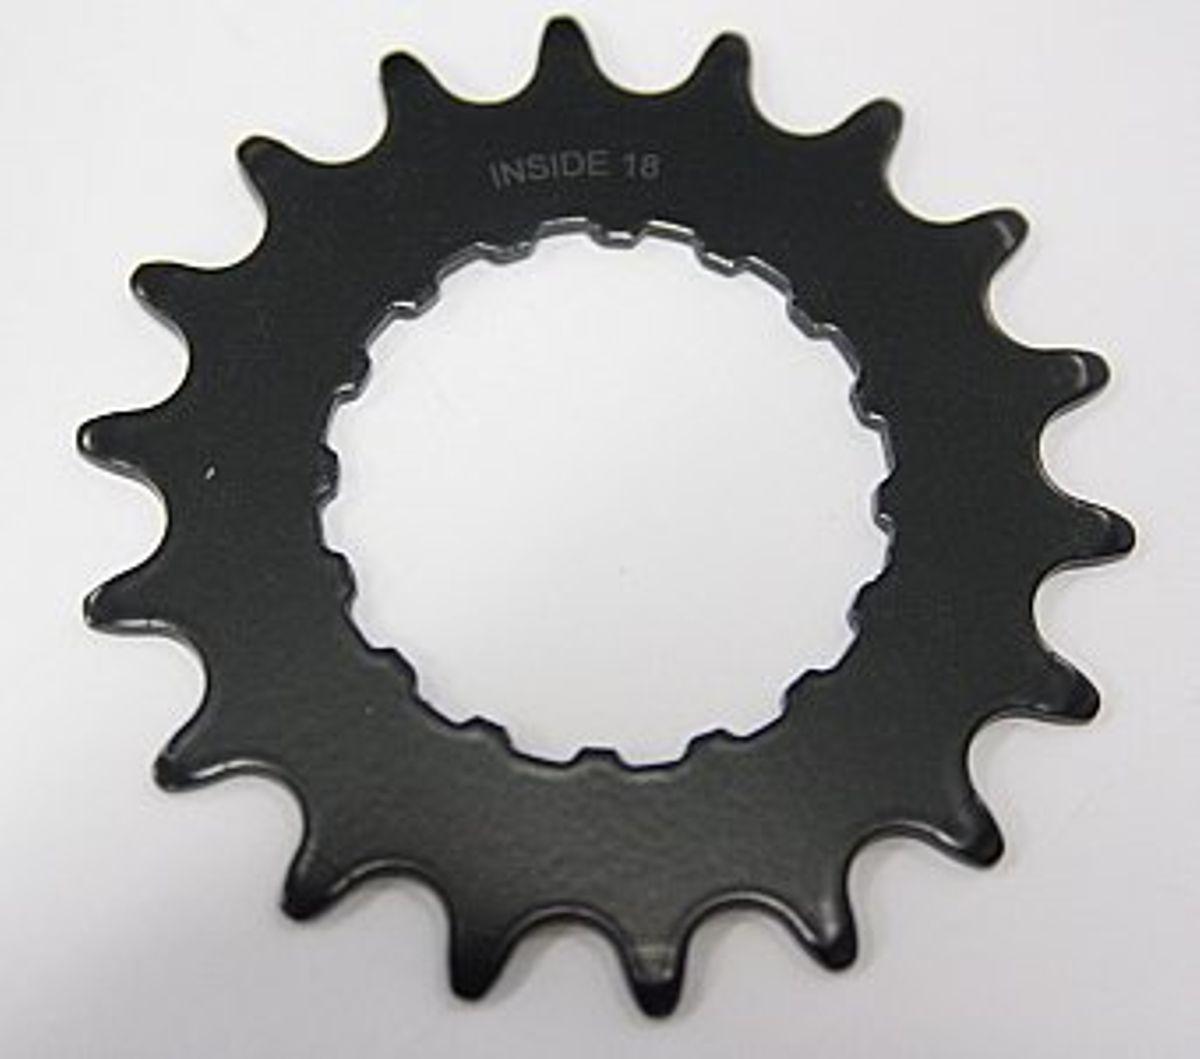 Kettingblad 18 tands 3/32 001 Black